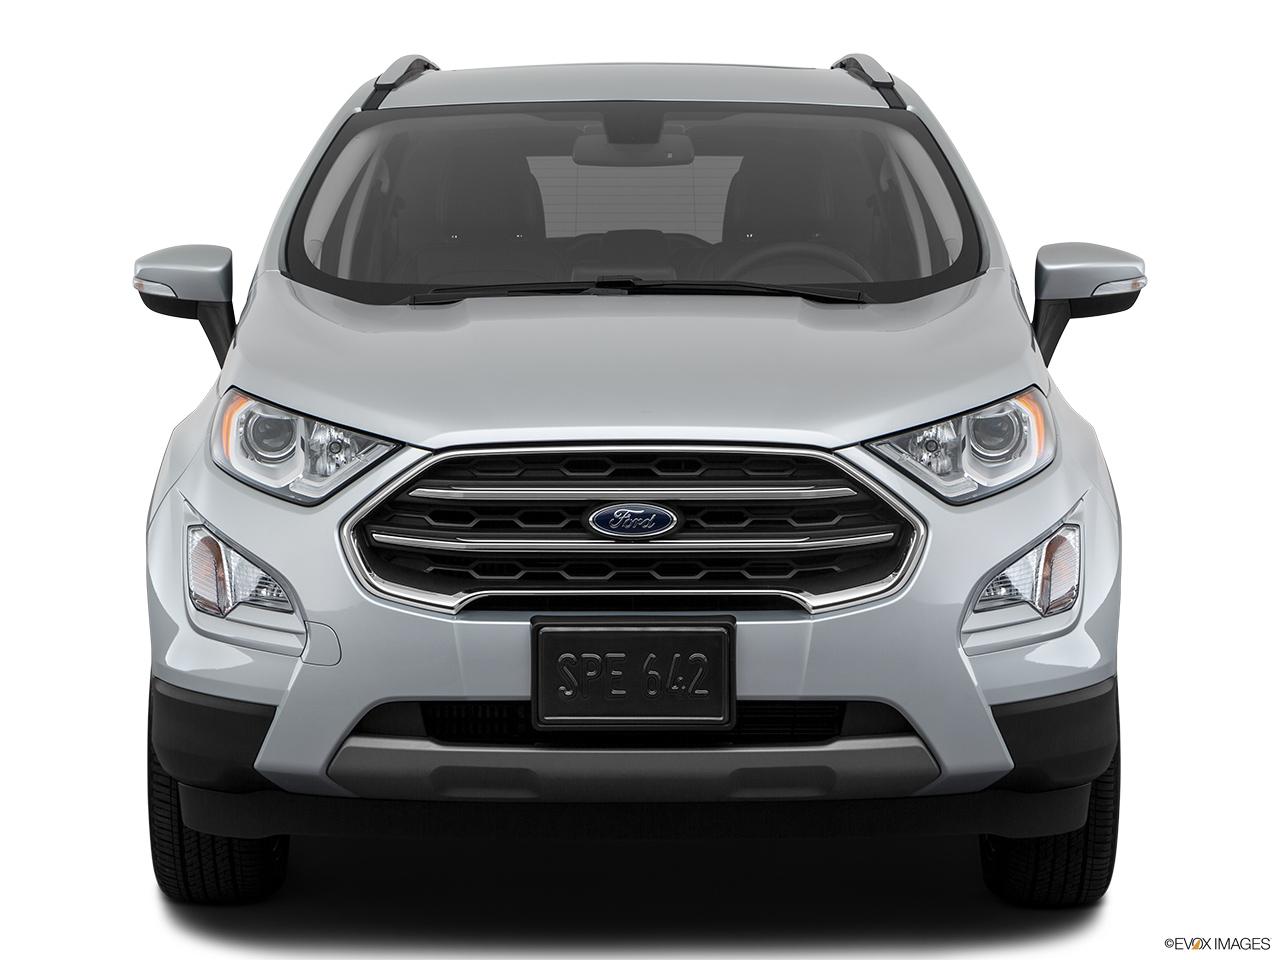 Ford EcoSport 2018 1.5 Titanium, Saudi Arabia, Low/wide front.